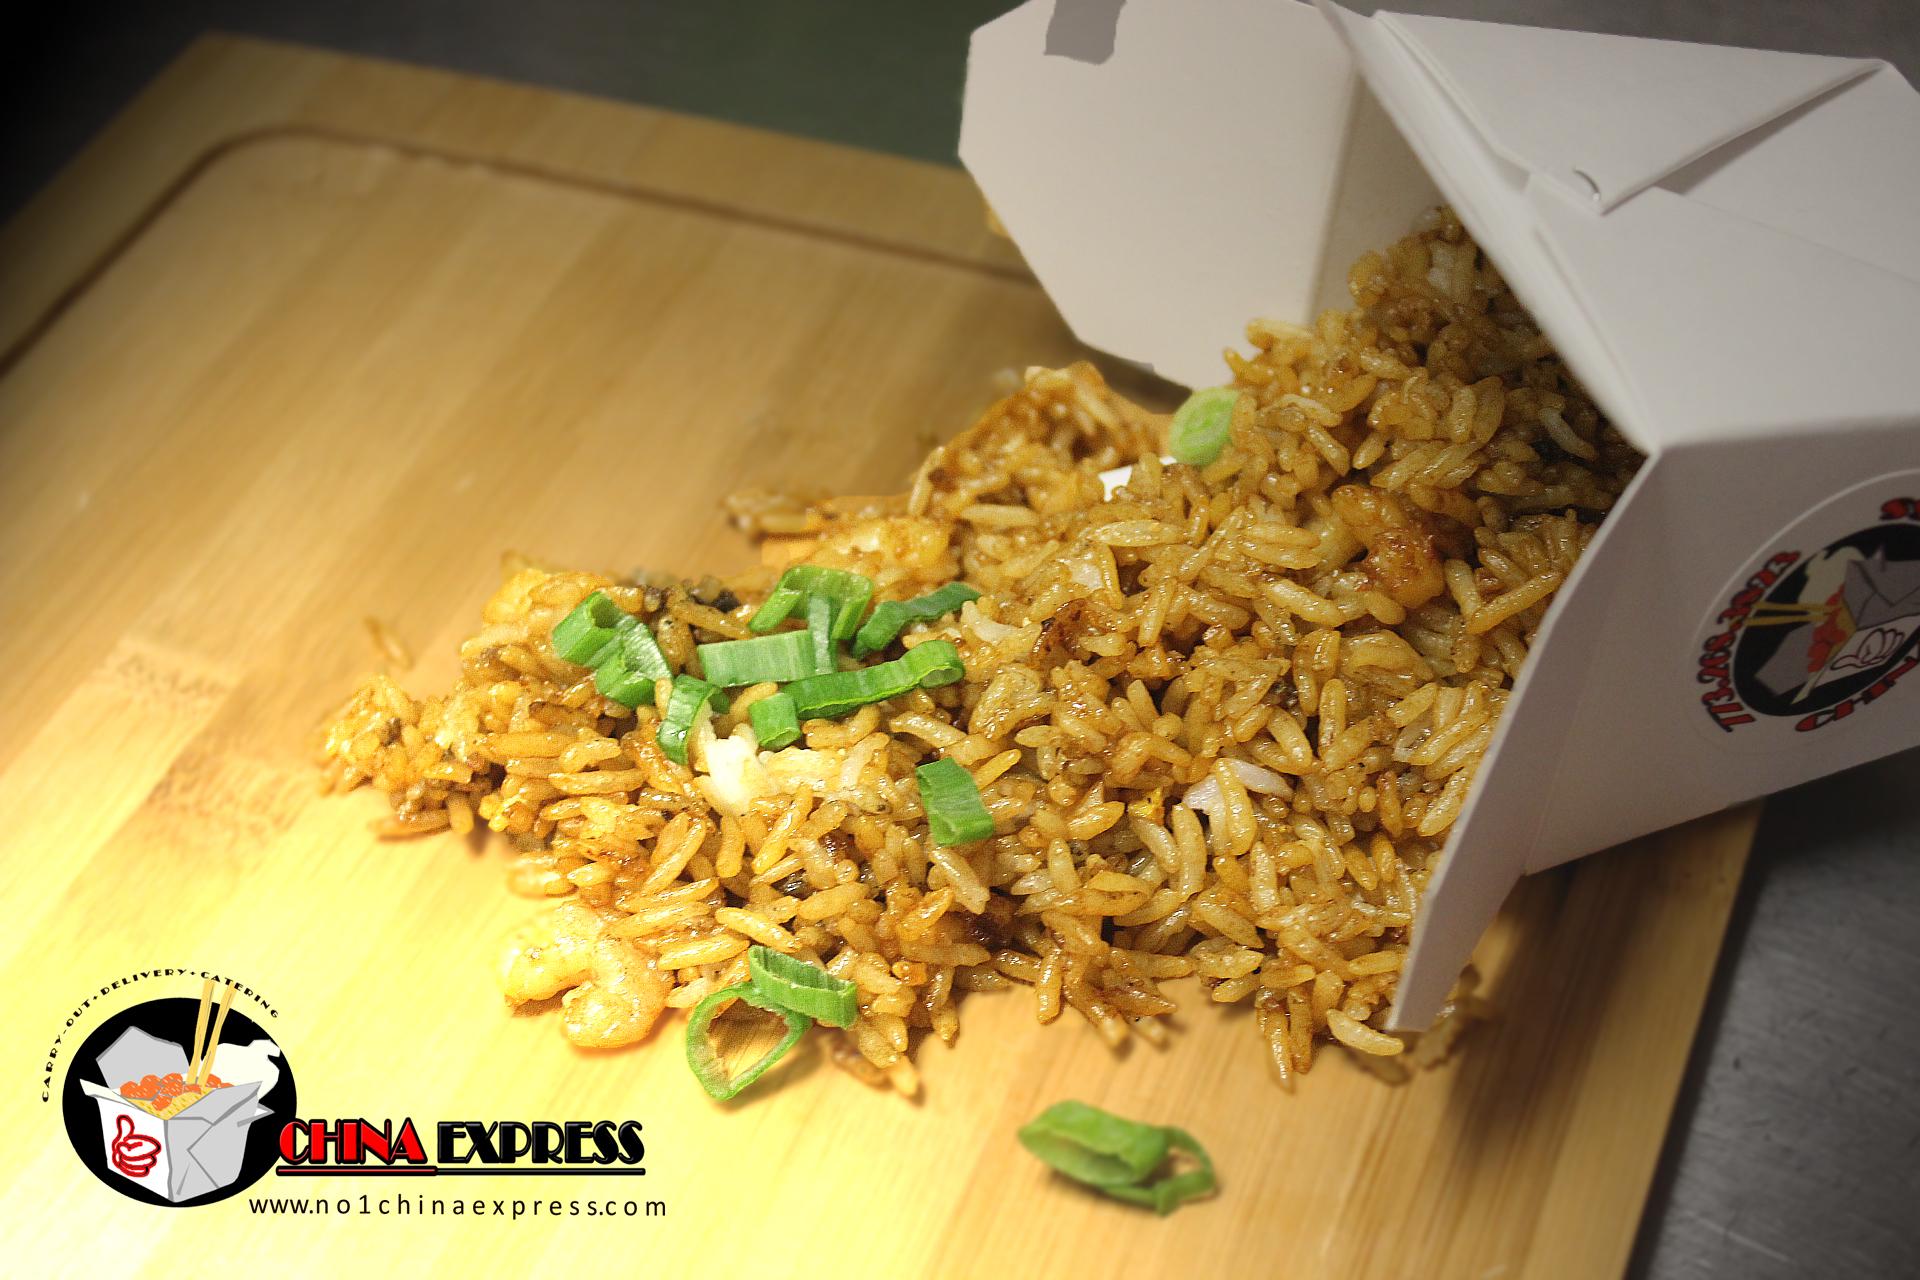 (L) Fried Rice Image